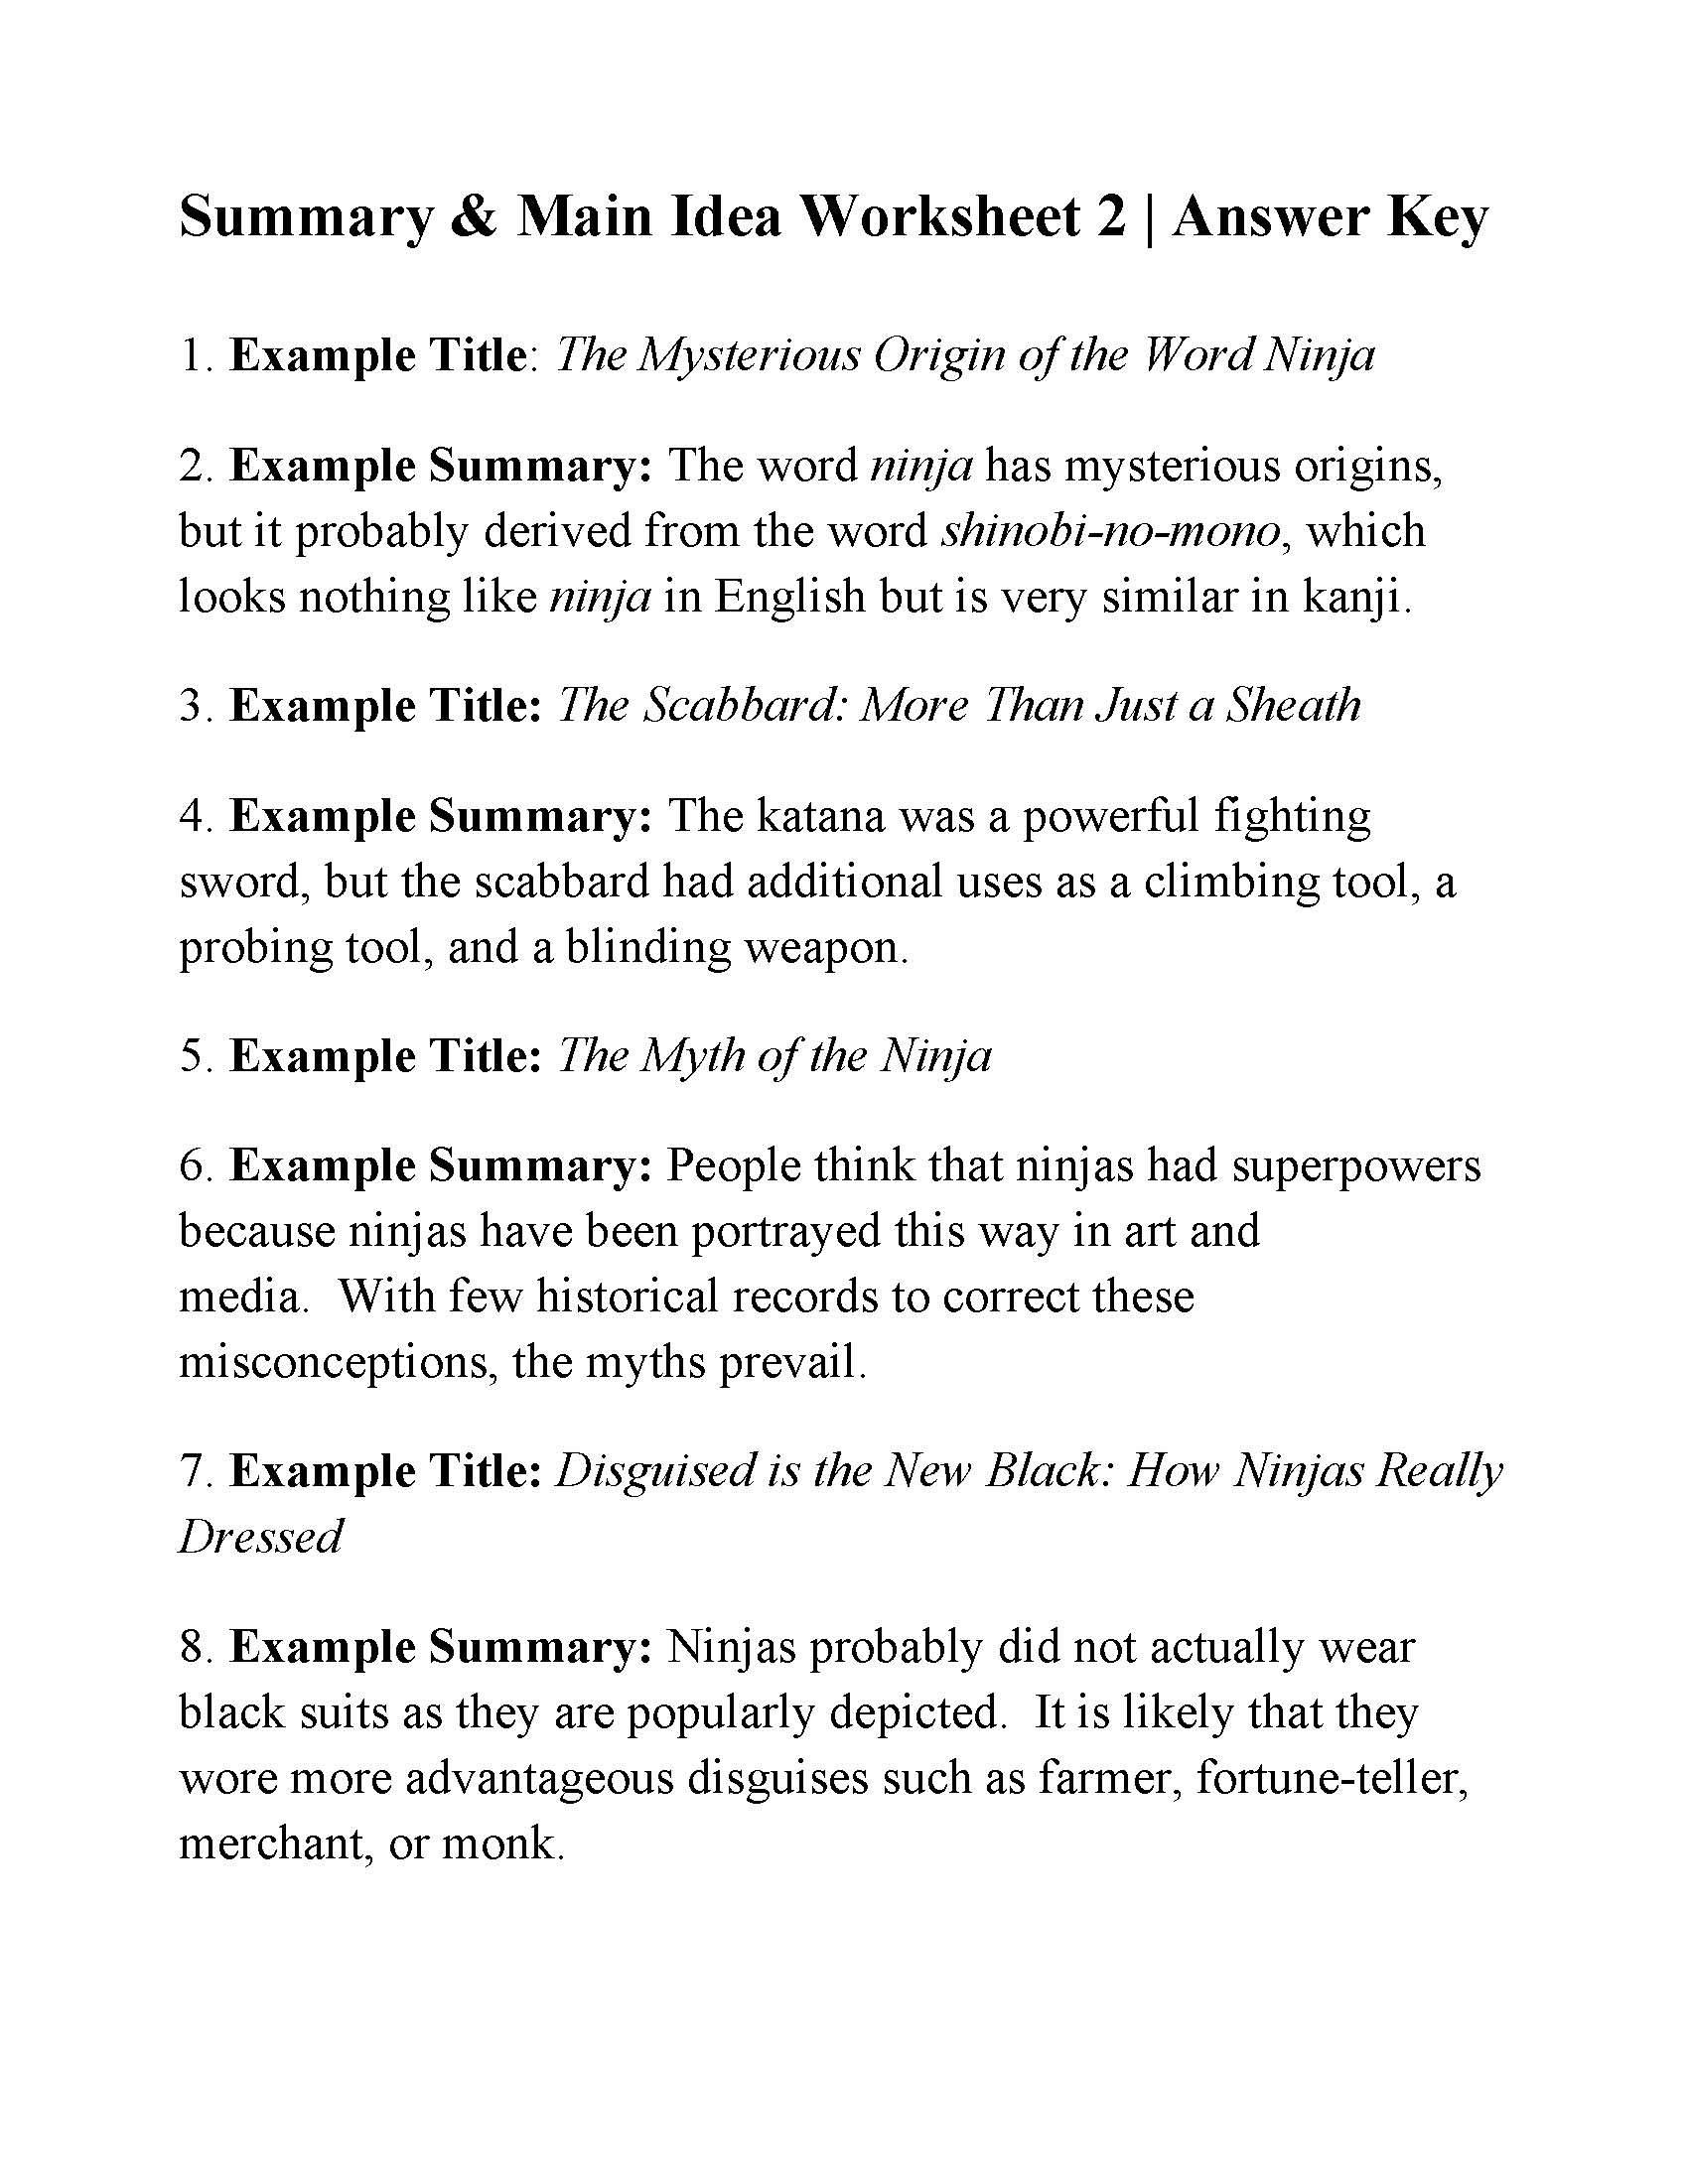 6th Grade Summarizing Worksheets Summary and Main Idea Worksheet 2